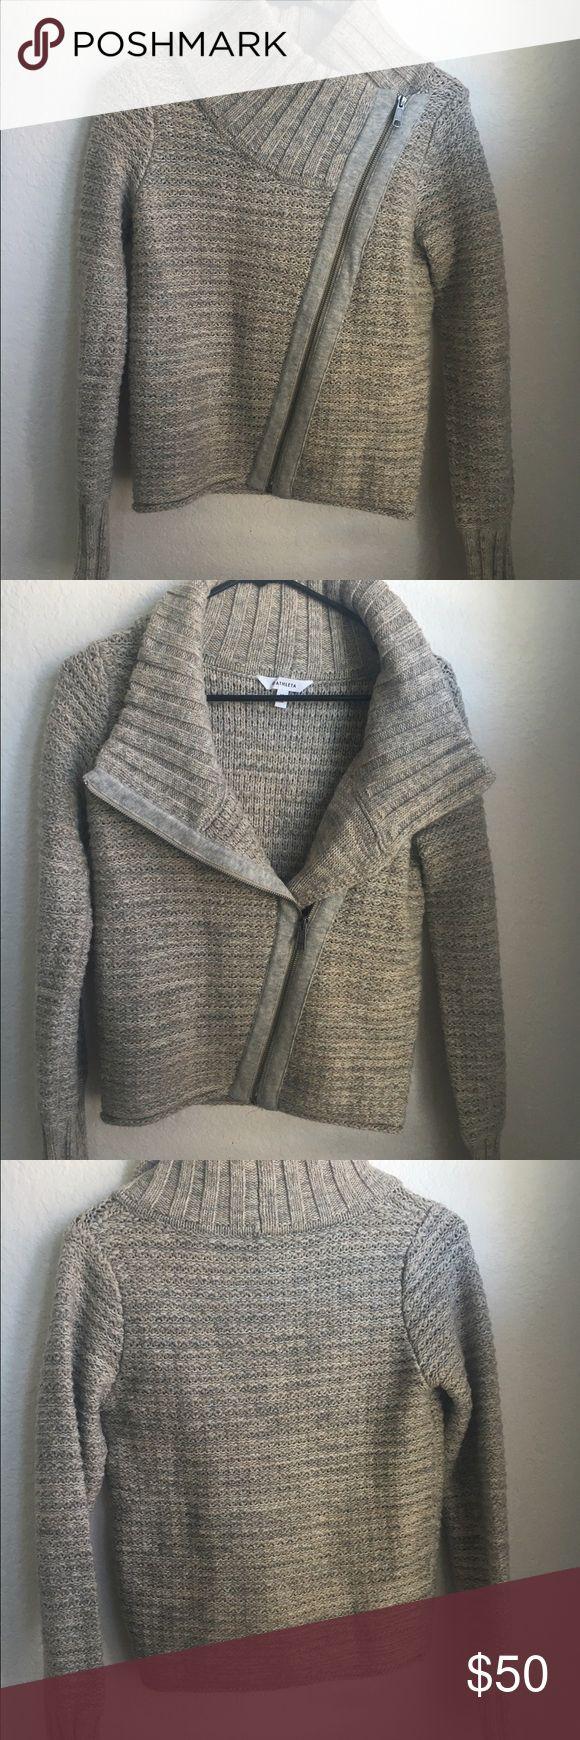 Athleta 100% Merino Wool Sweater Jacket Beautiful oatmeal colored merino wool sweater, like new condition.  Original list price is estimated. Athleta Sweaters Cardigans